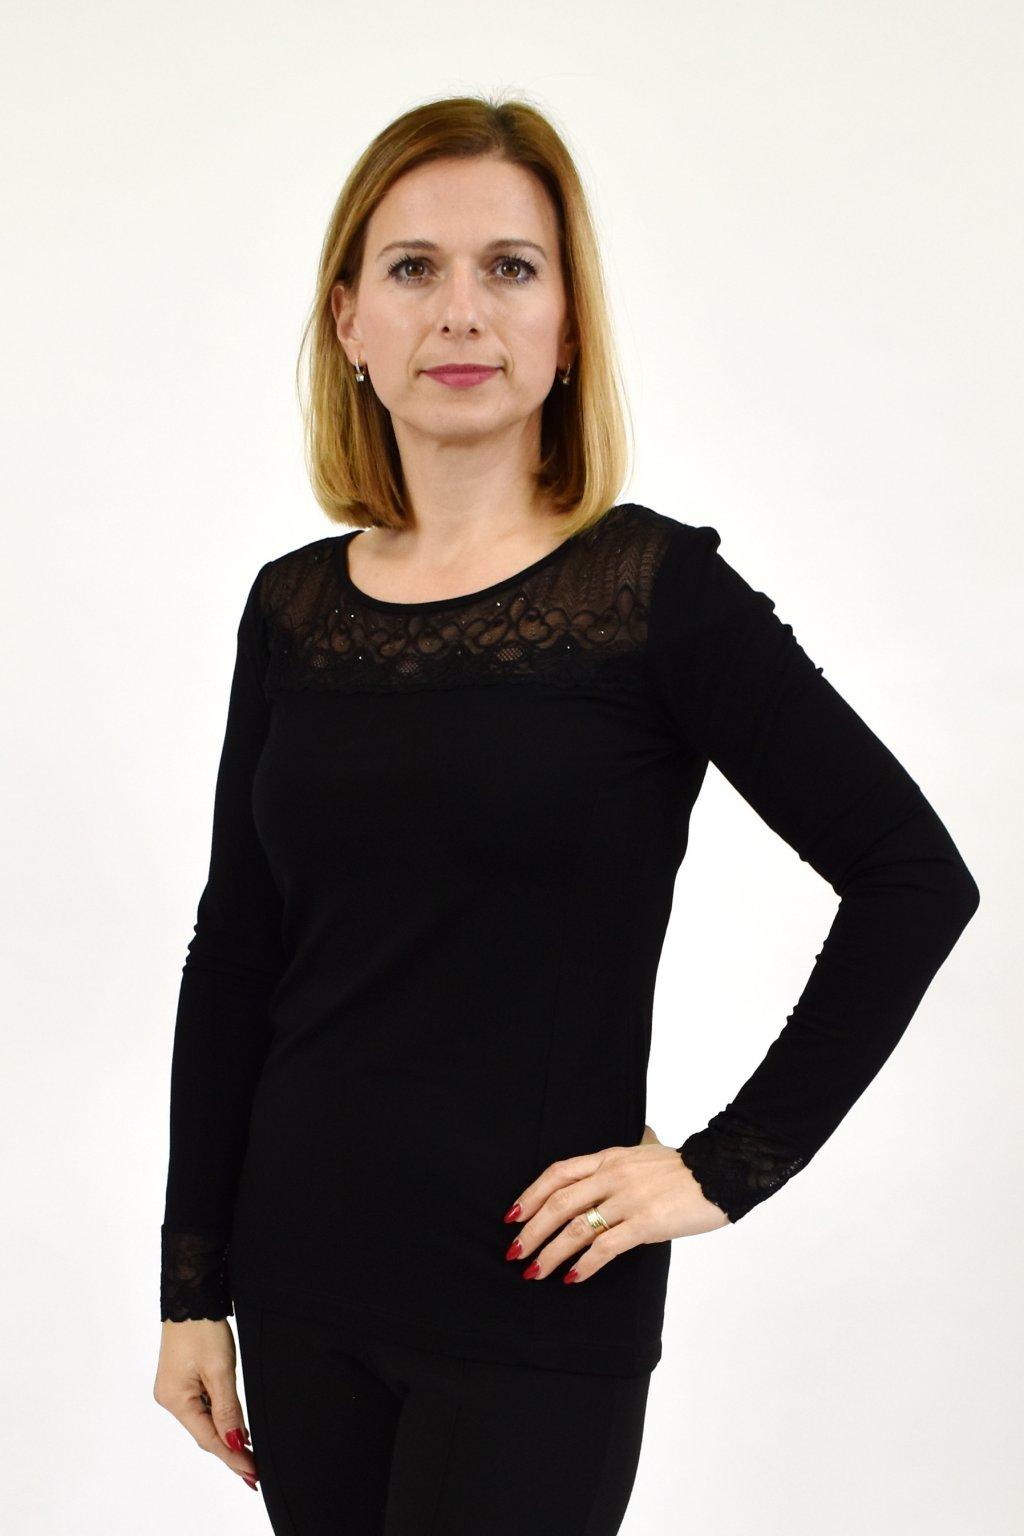 čierne-tričko-favab.sk.jpg